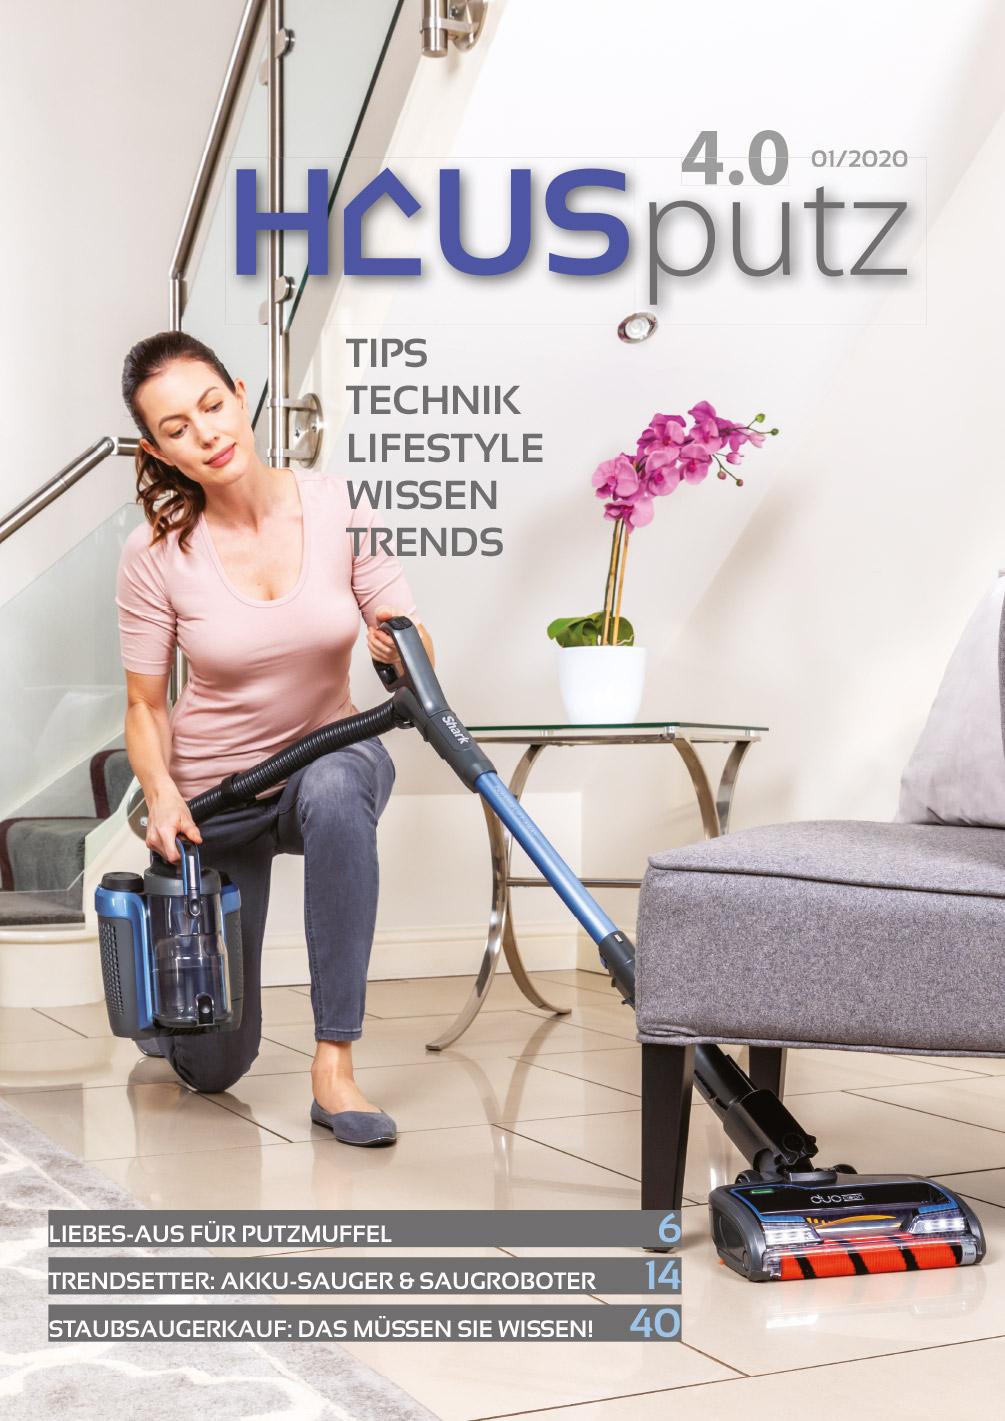 Titelseite Hausputz 4.0 / 2020